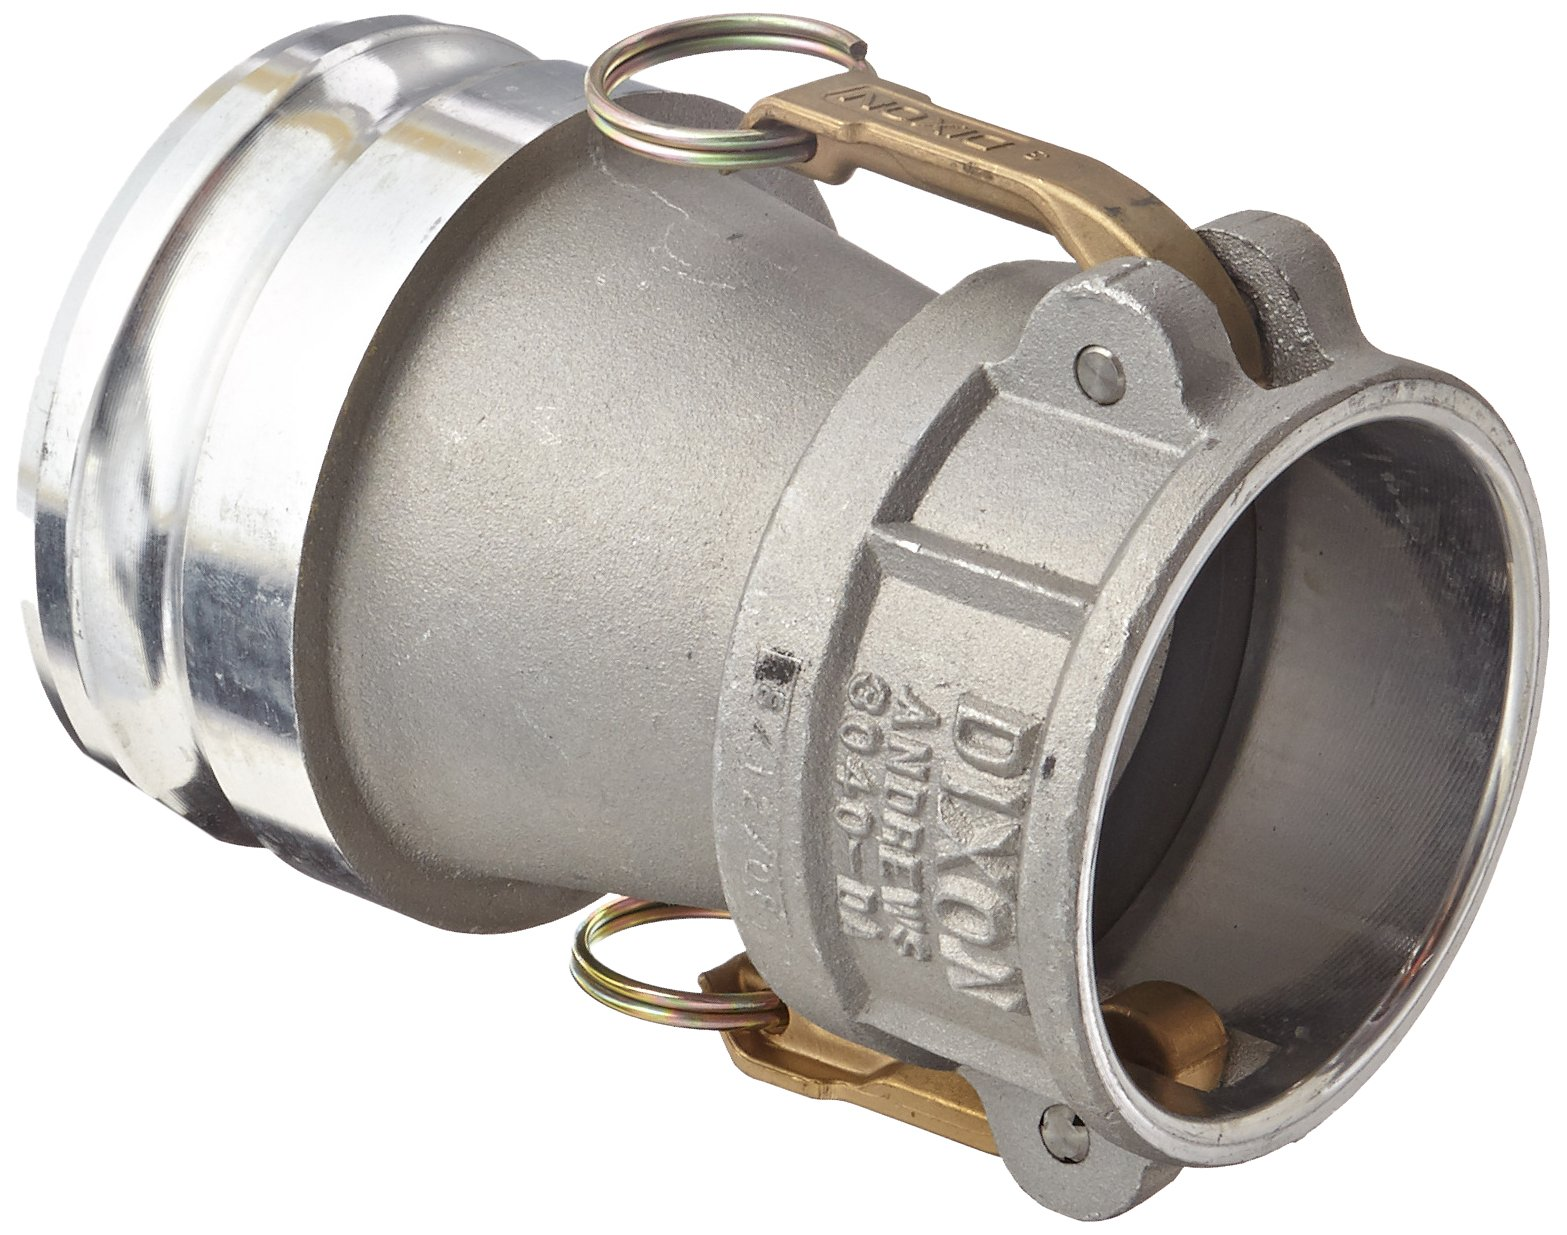 Dixon 3040-DA-AL Reducing Coupler & Adapter, (Box of 5)